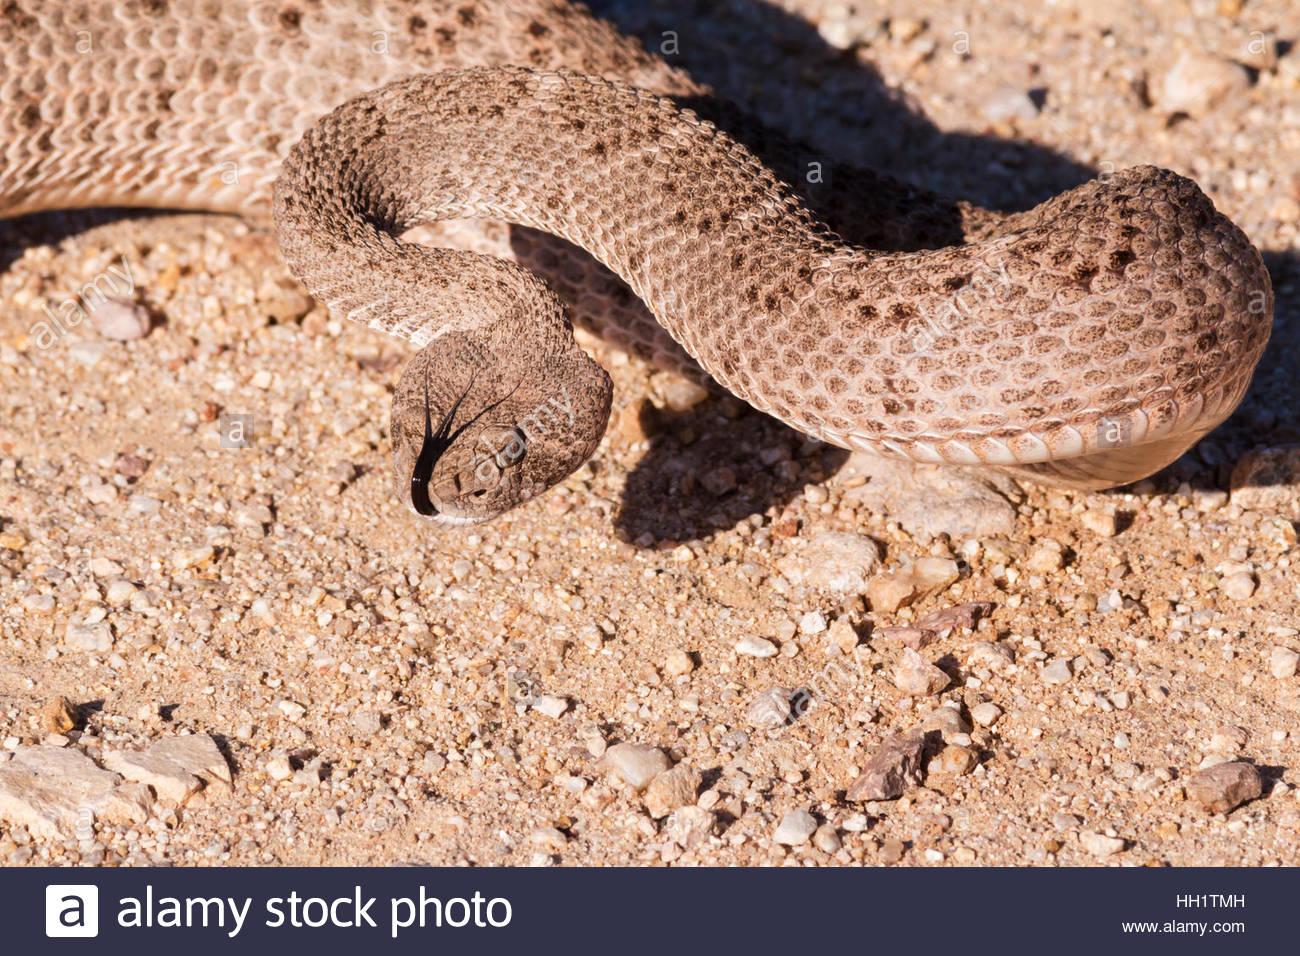 Western Diamond-backed Rattlesnake Crotalus atrox Arizona Stock Photo